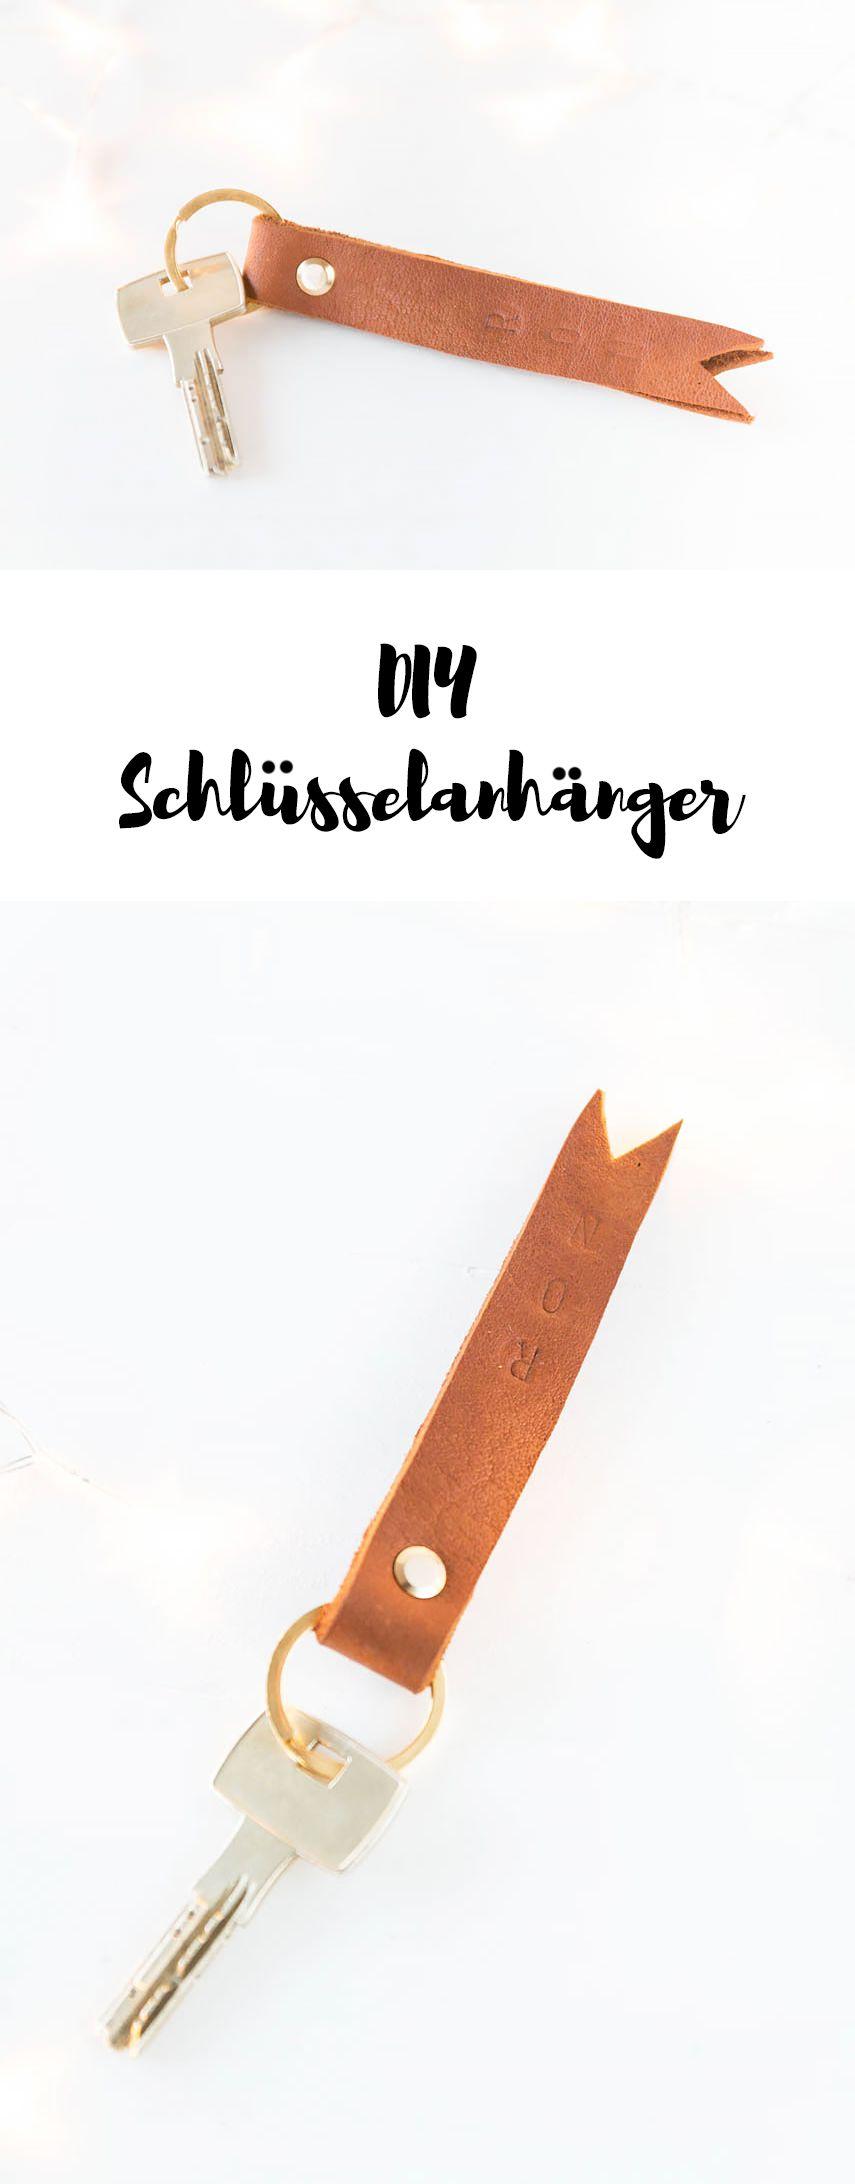 12 Schlusselanhanger Aus Leder Leather Pinterest Diy Diy